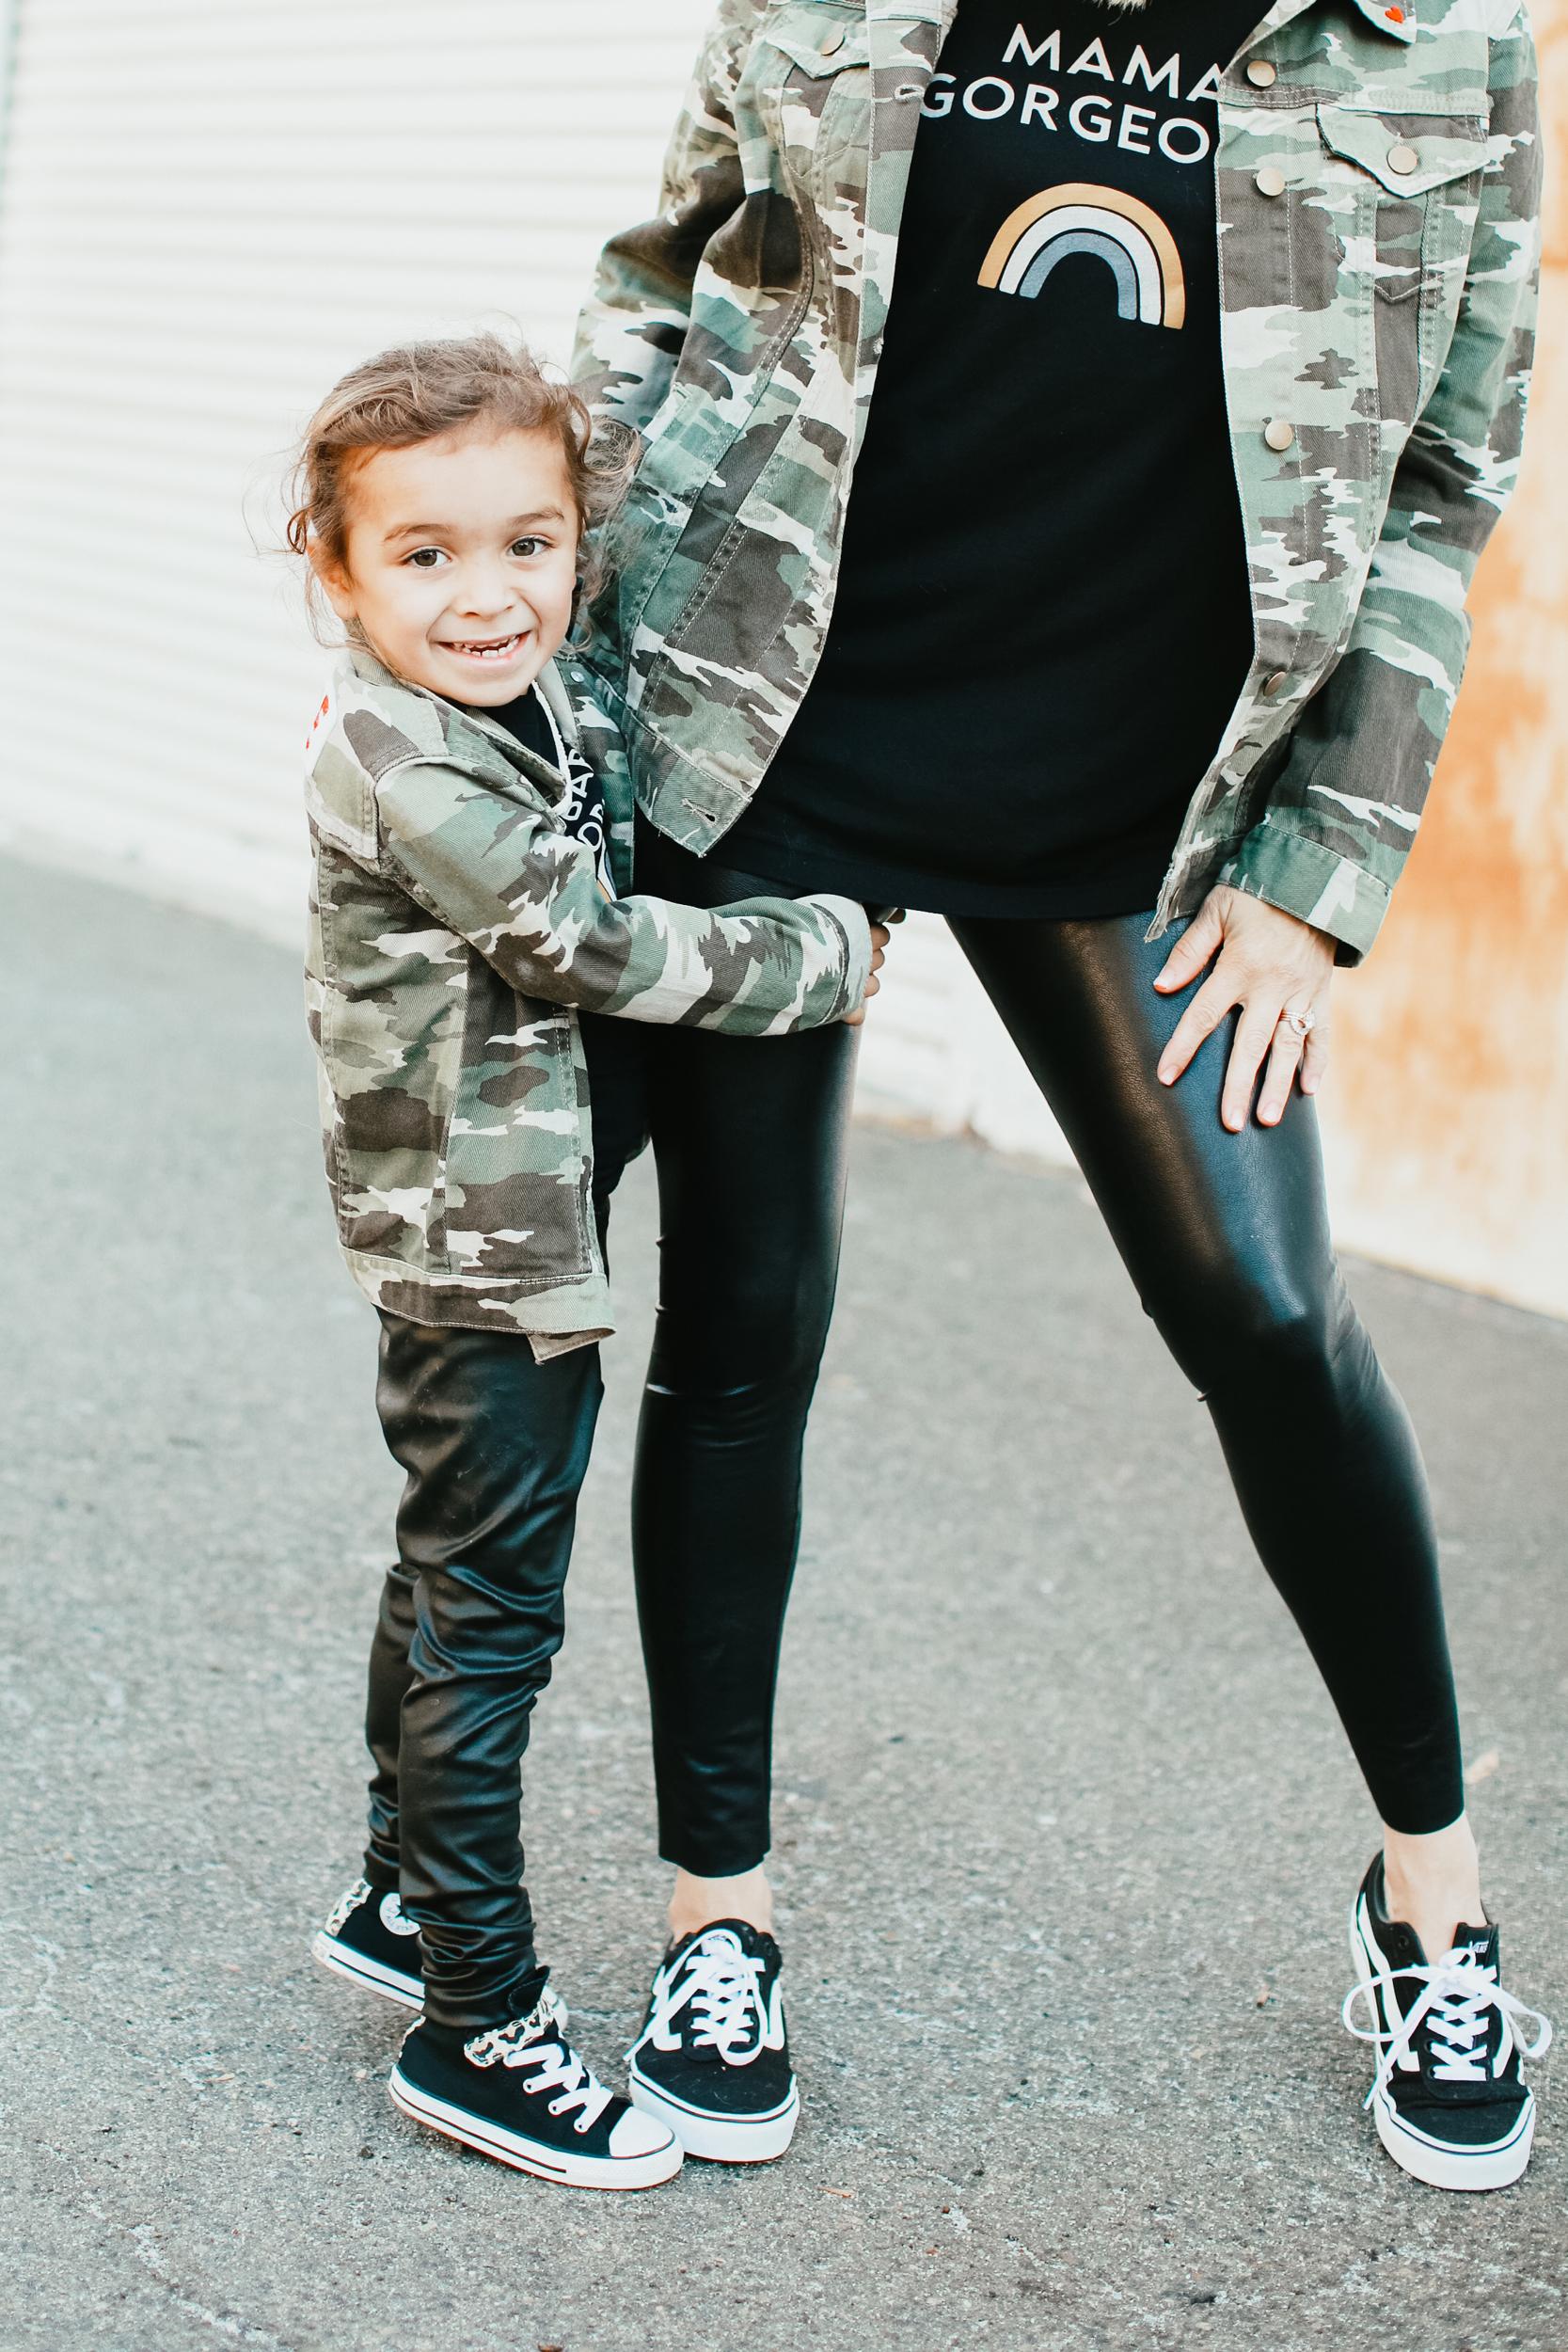 kid holding onto mom